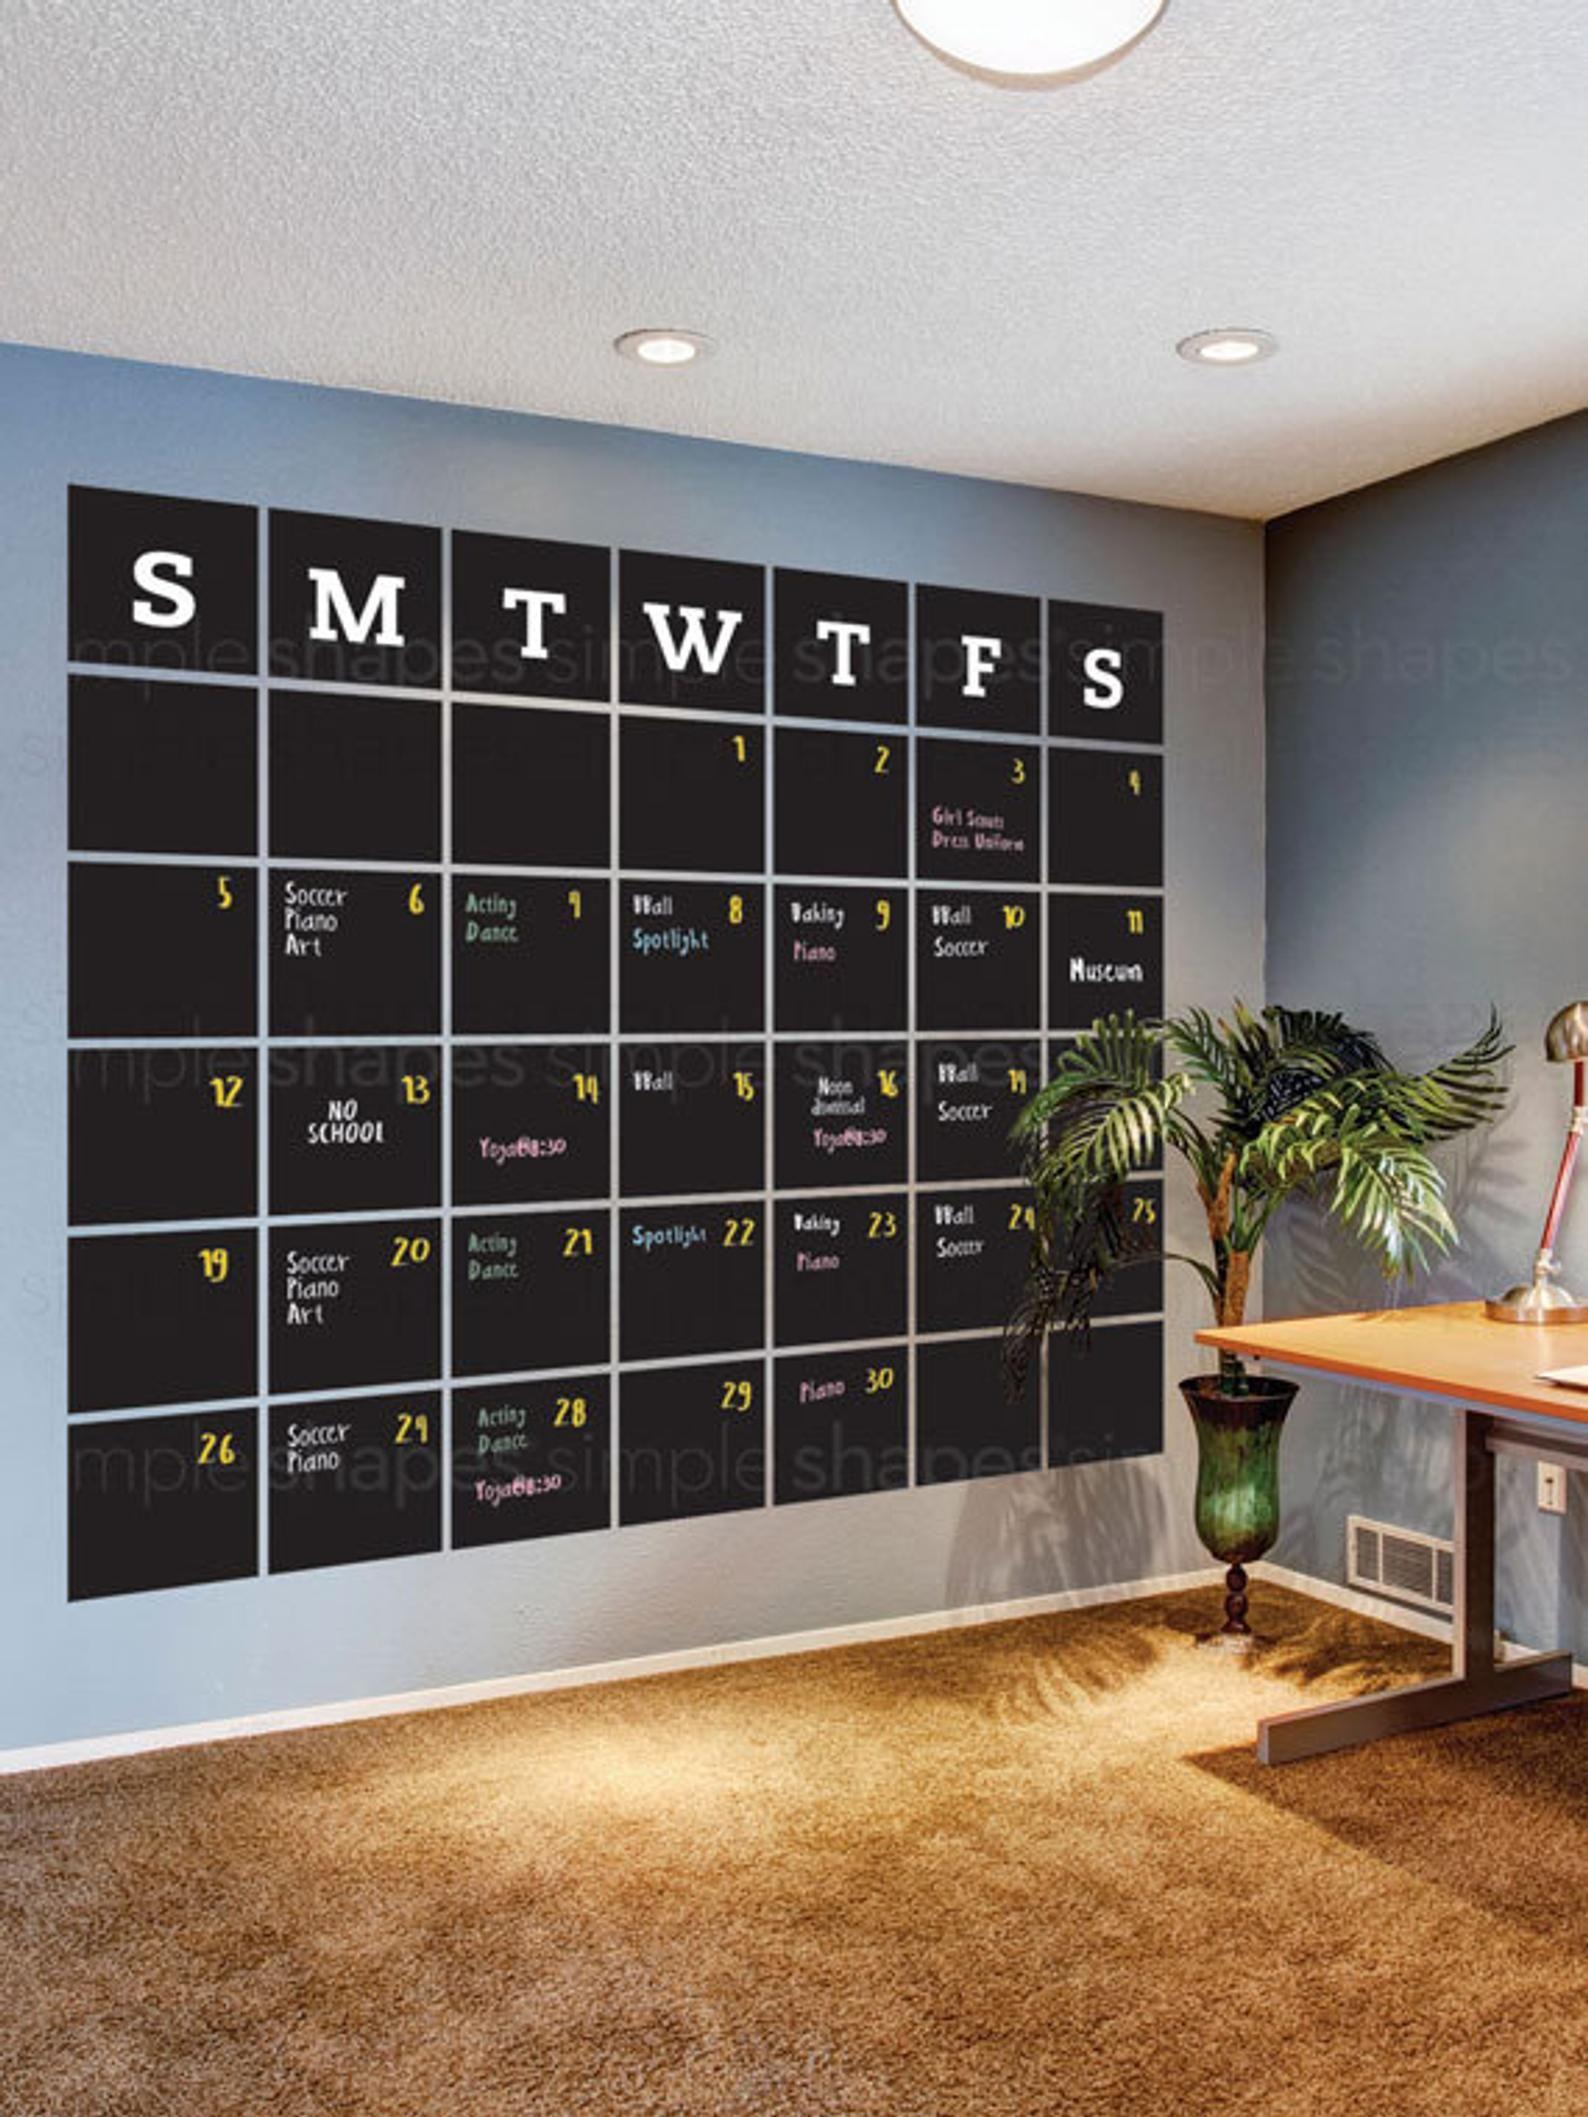 Chalkboard 2018 wall decal calendar blackboard calendar